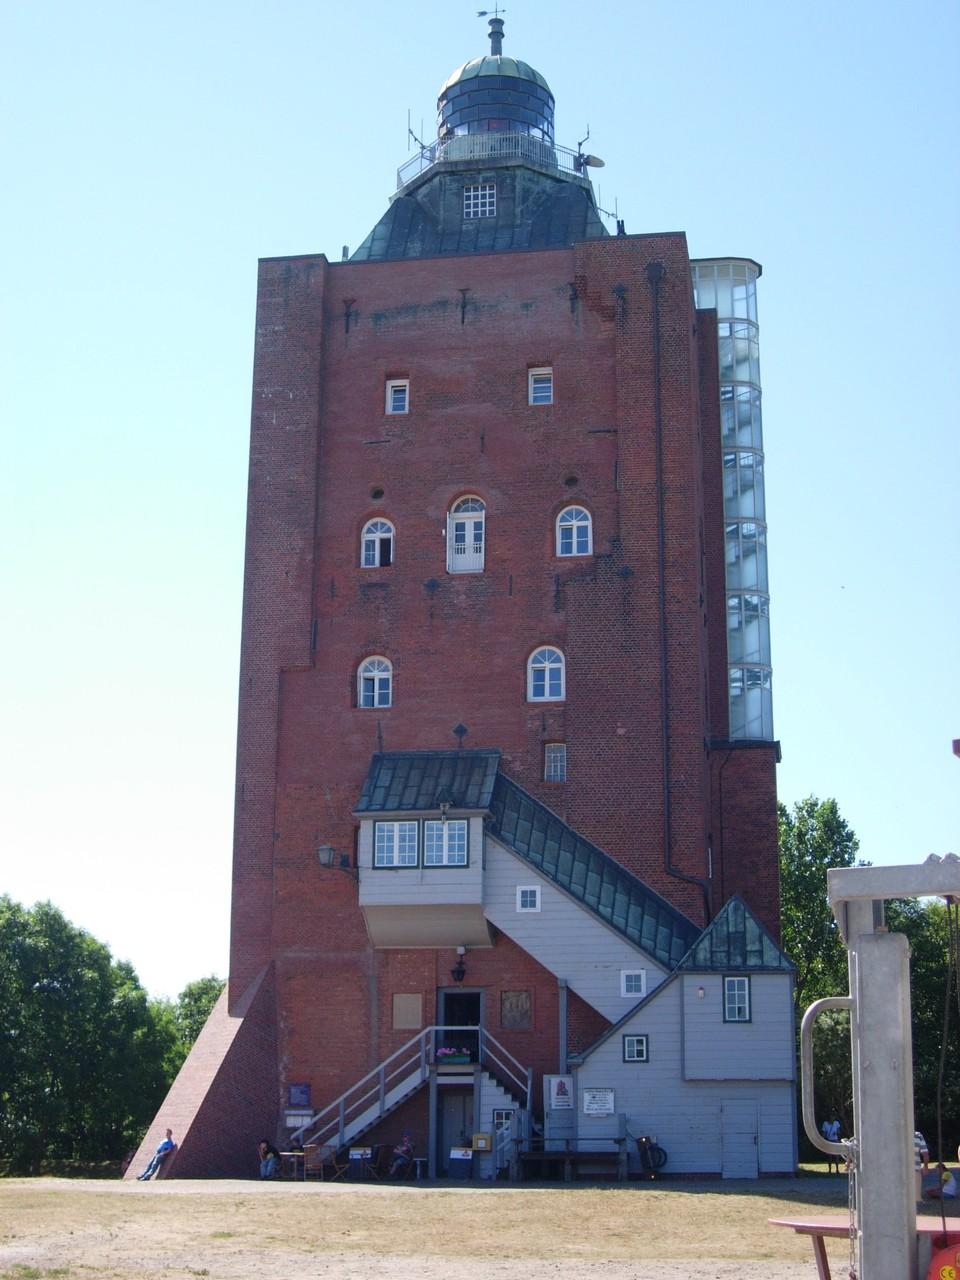 Neuwerker Leuchtturm